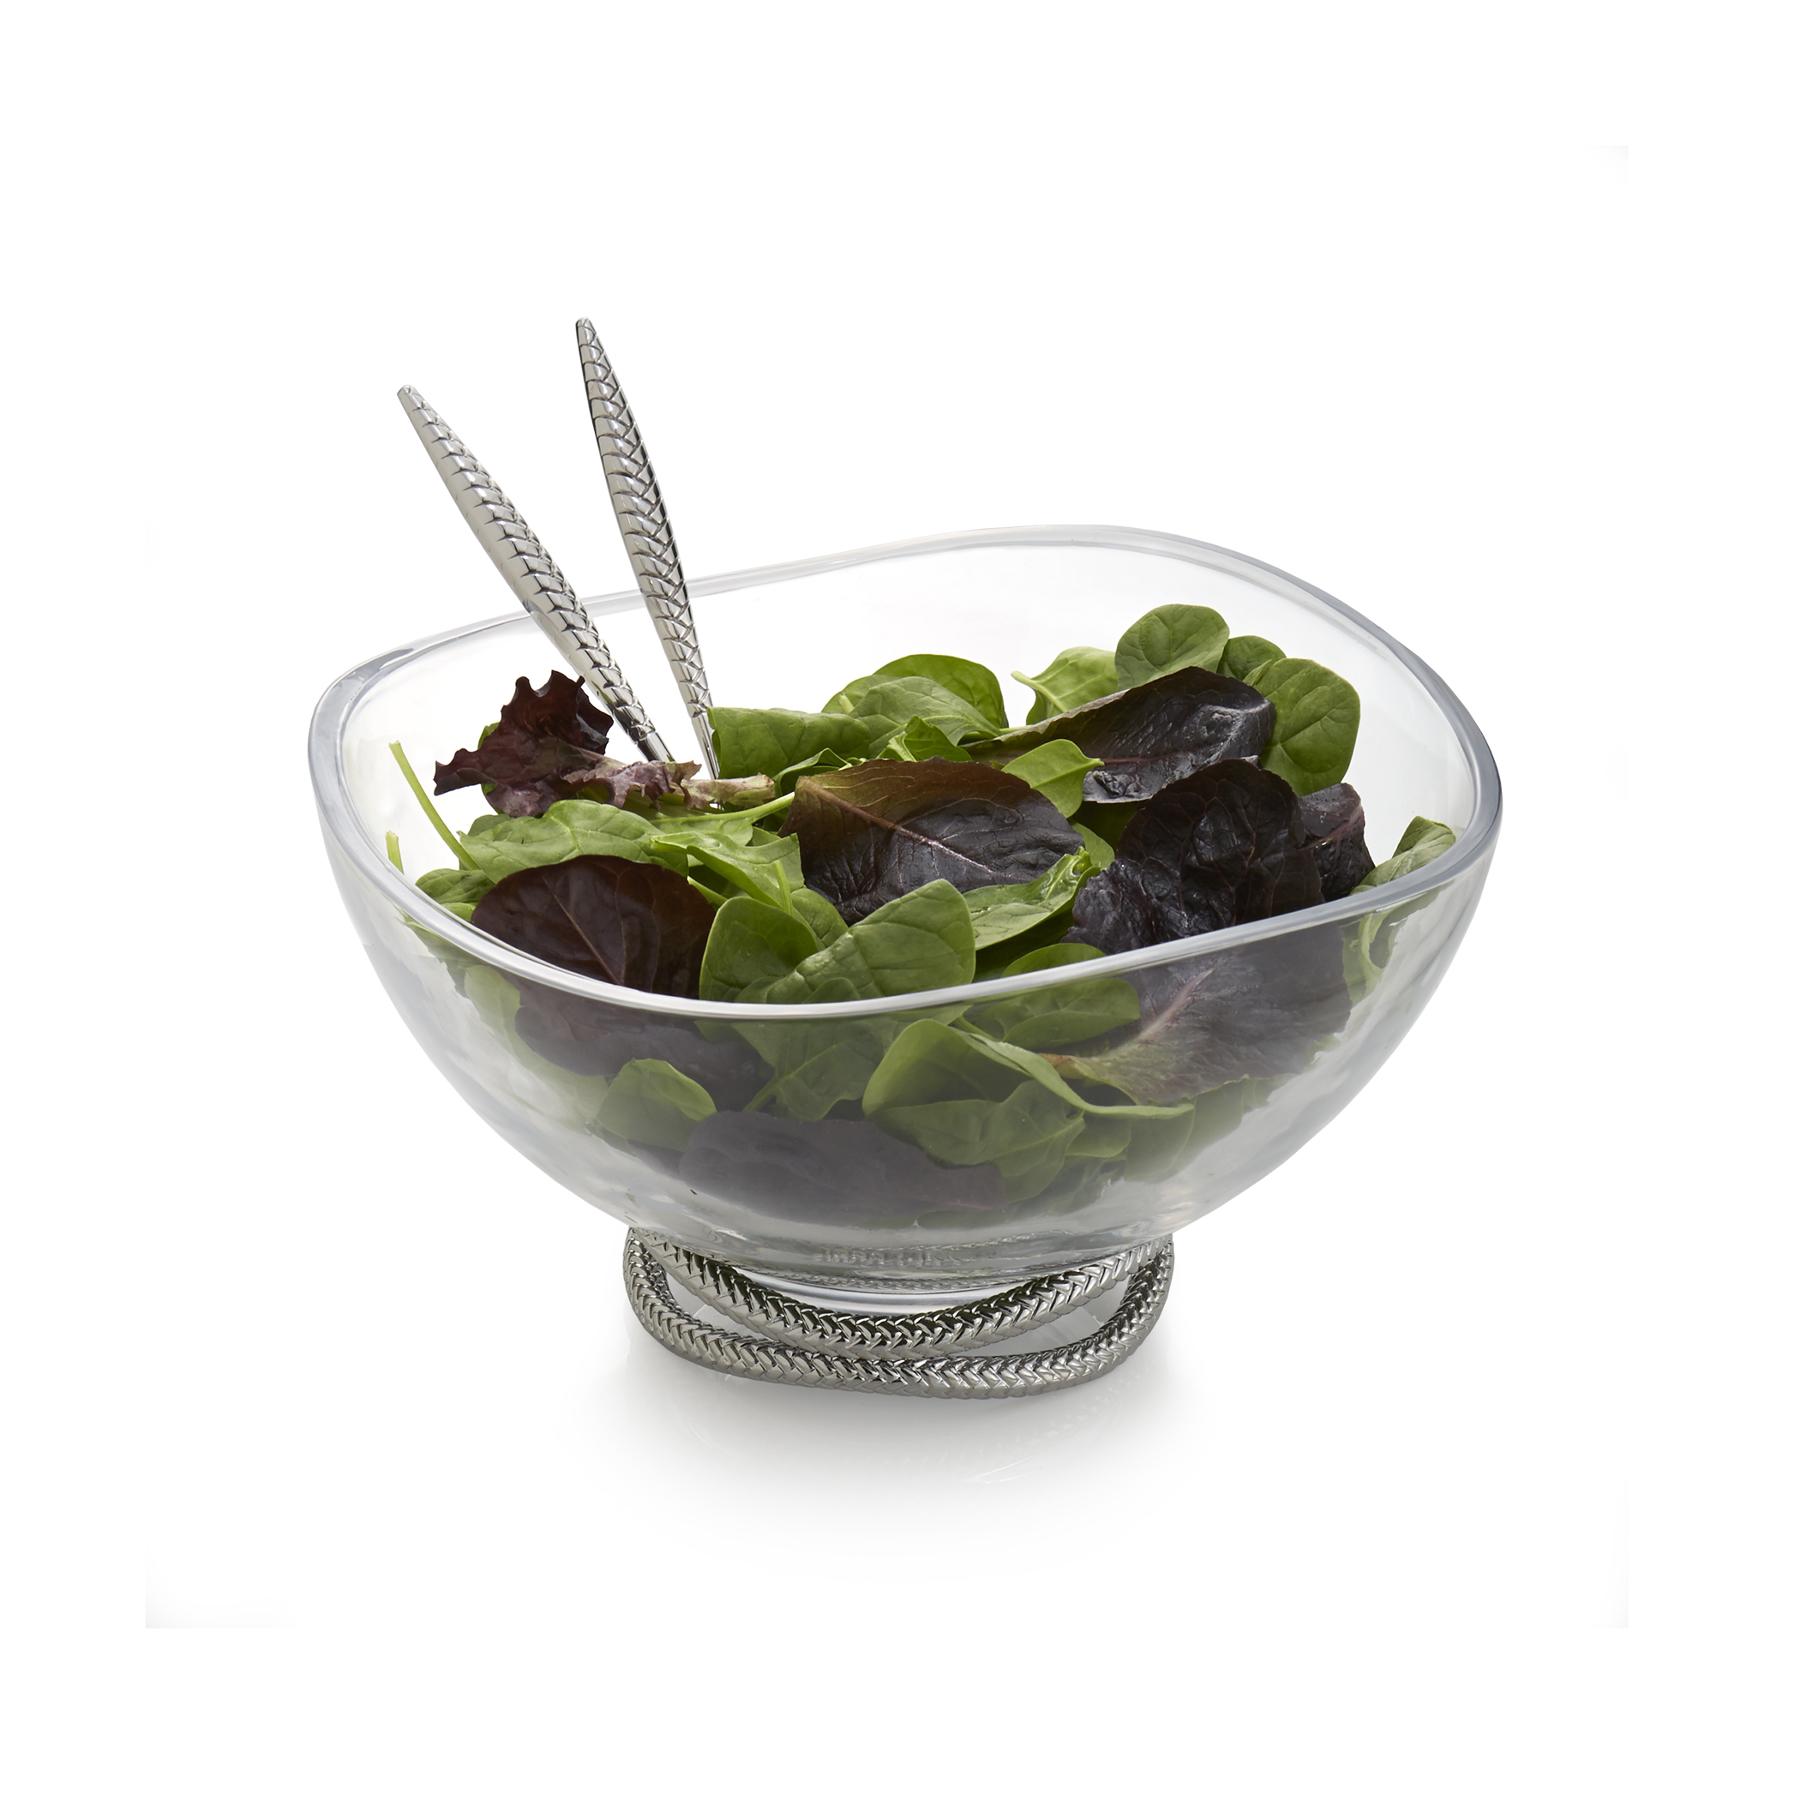 Nambe Braid Glass 12 Inch Salad Bowl with Servers